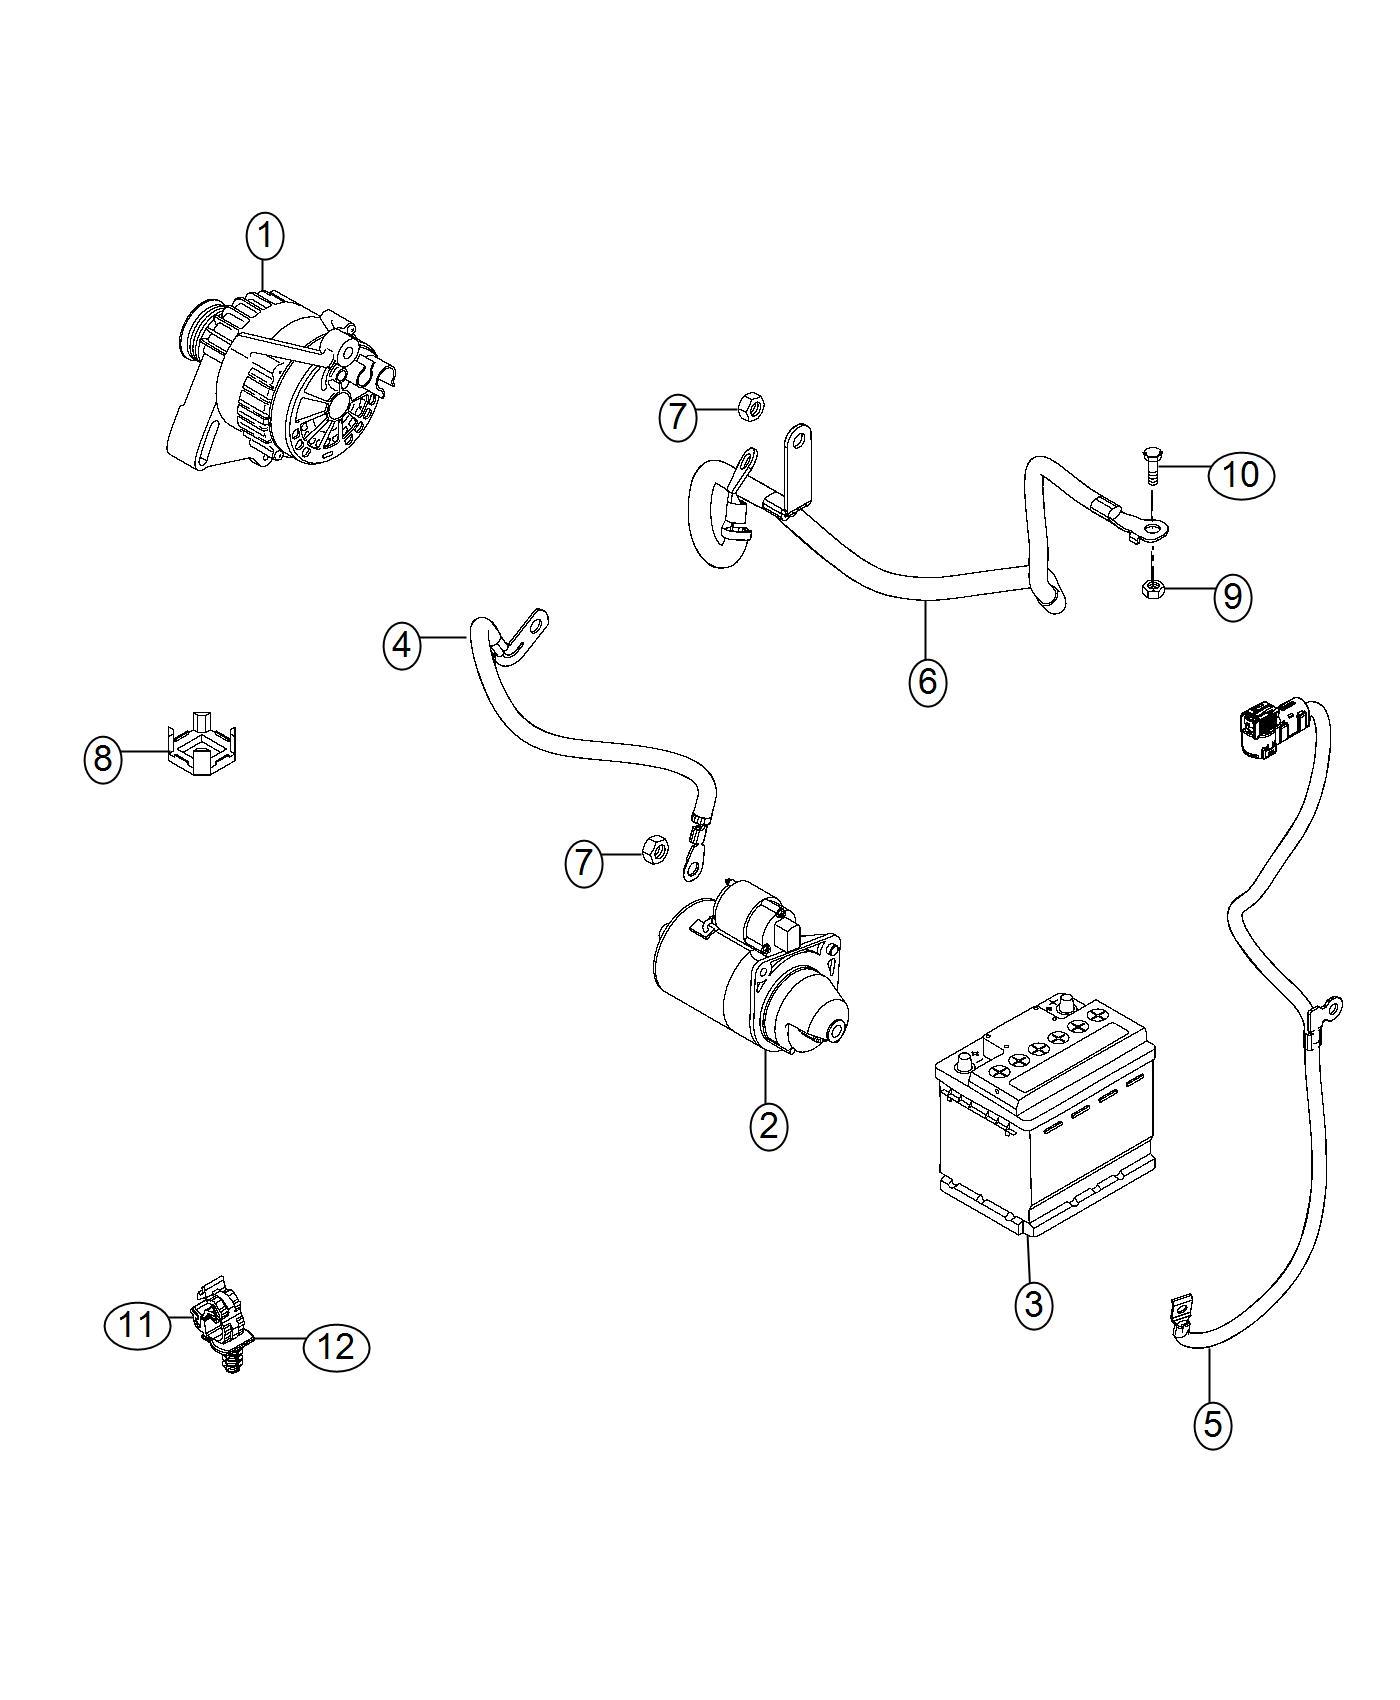 Ram Promaster City Wagon Screw Hex Head M8 Export